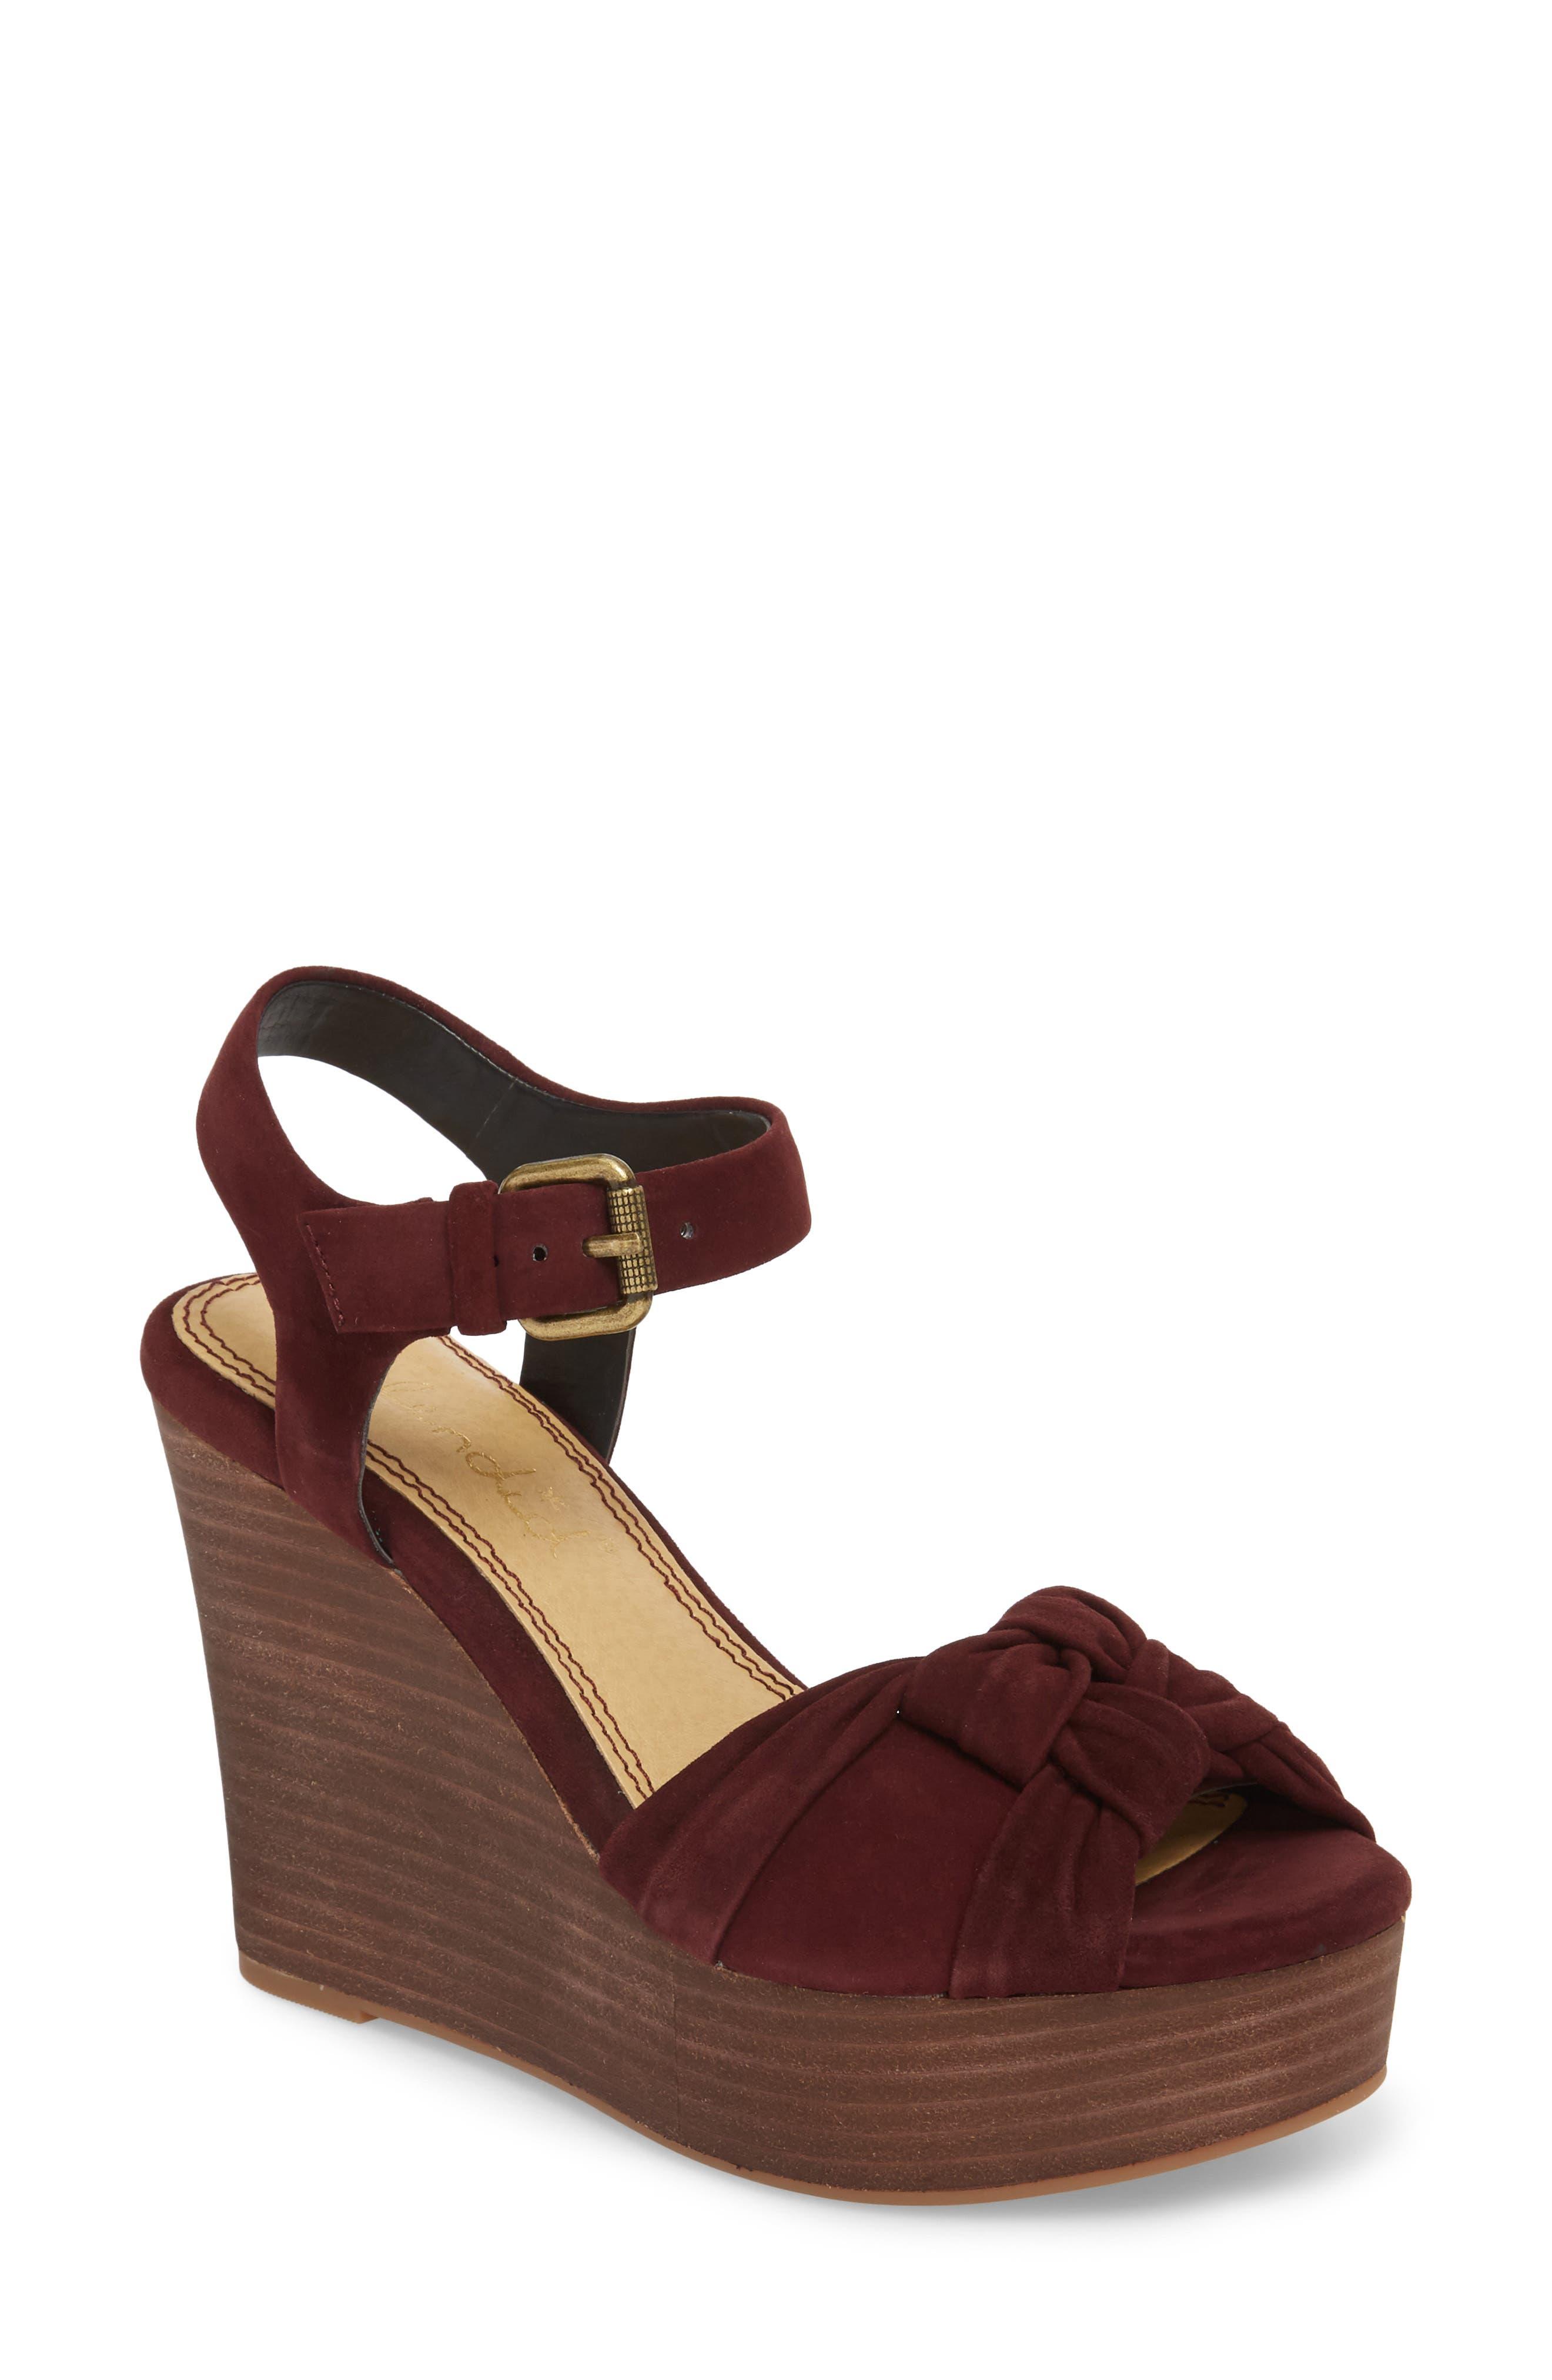 Nada Platform Wedge Sandal,                         Main,                         color, Deep Plum Suede